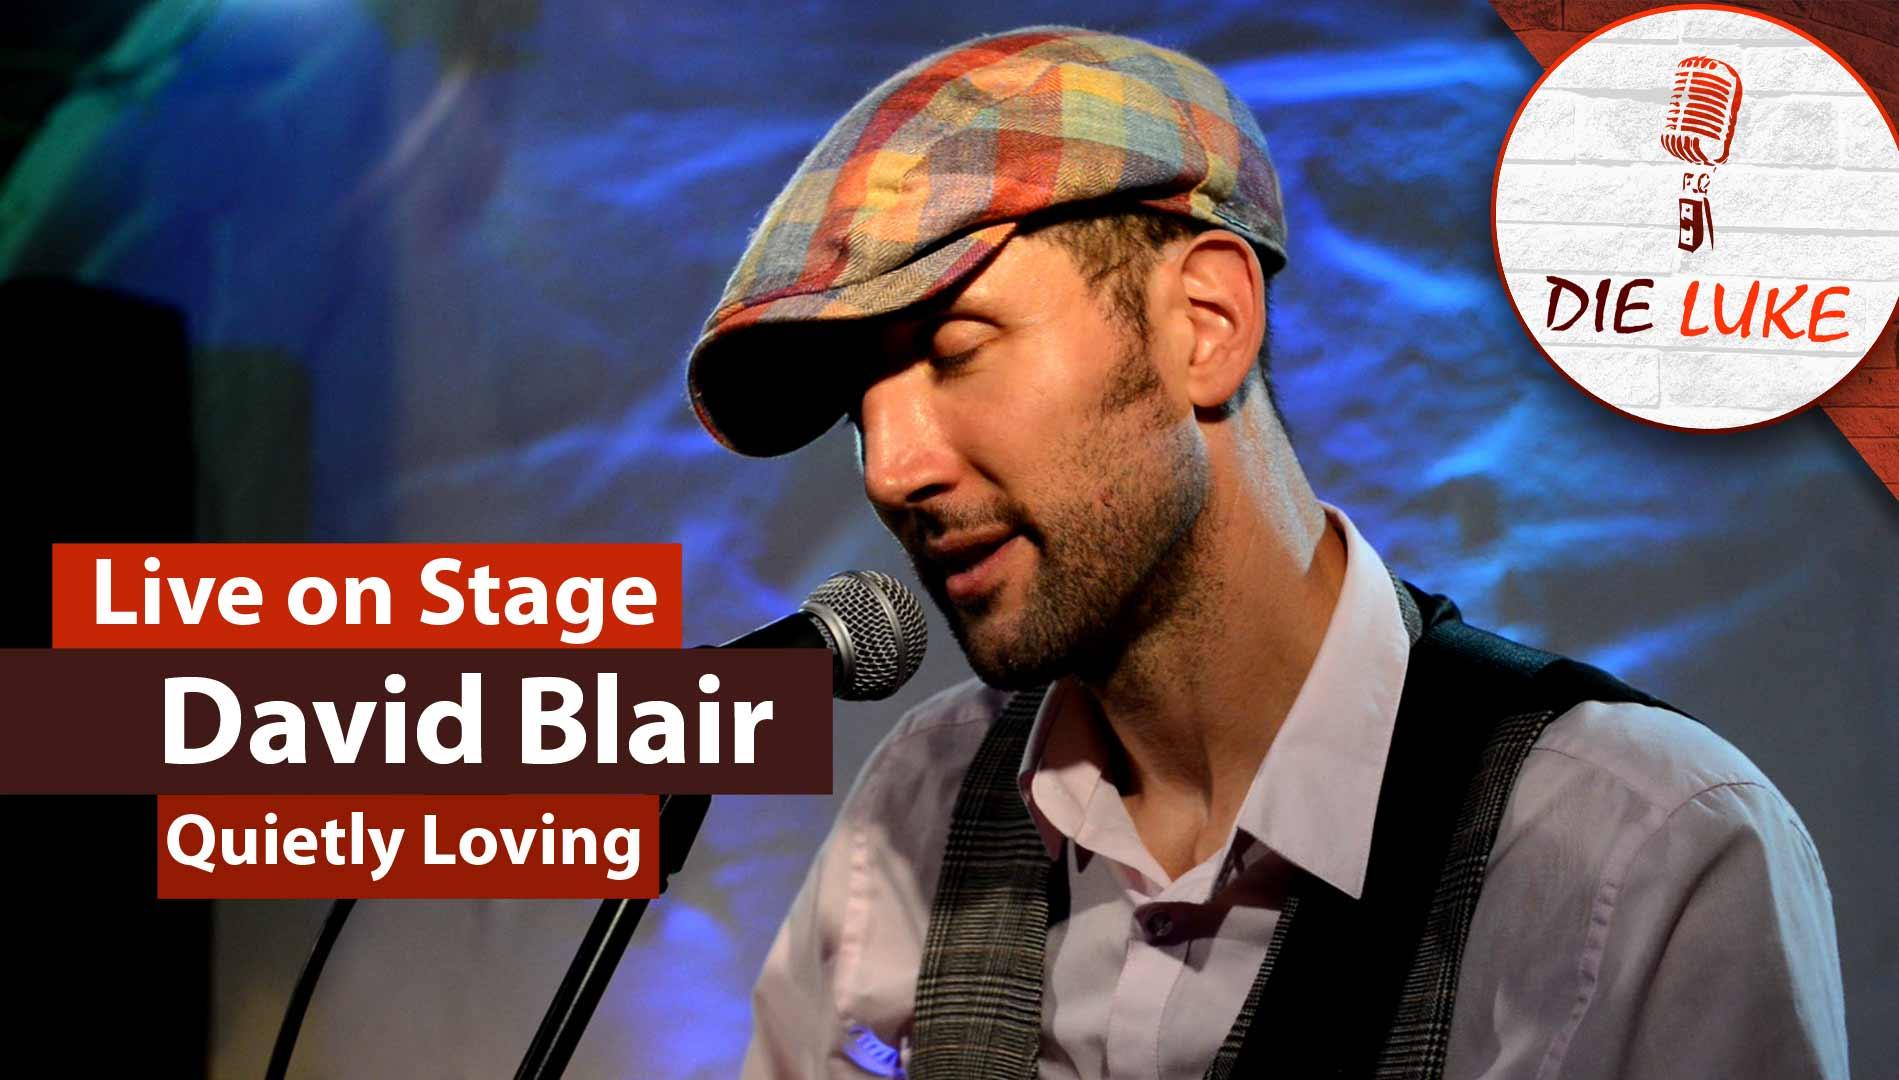 David Blair | Quietly Loving